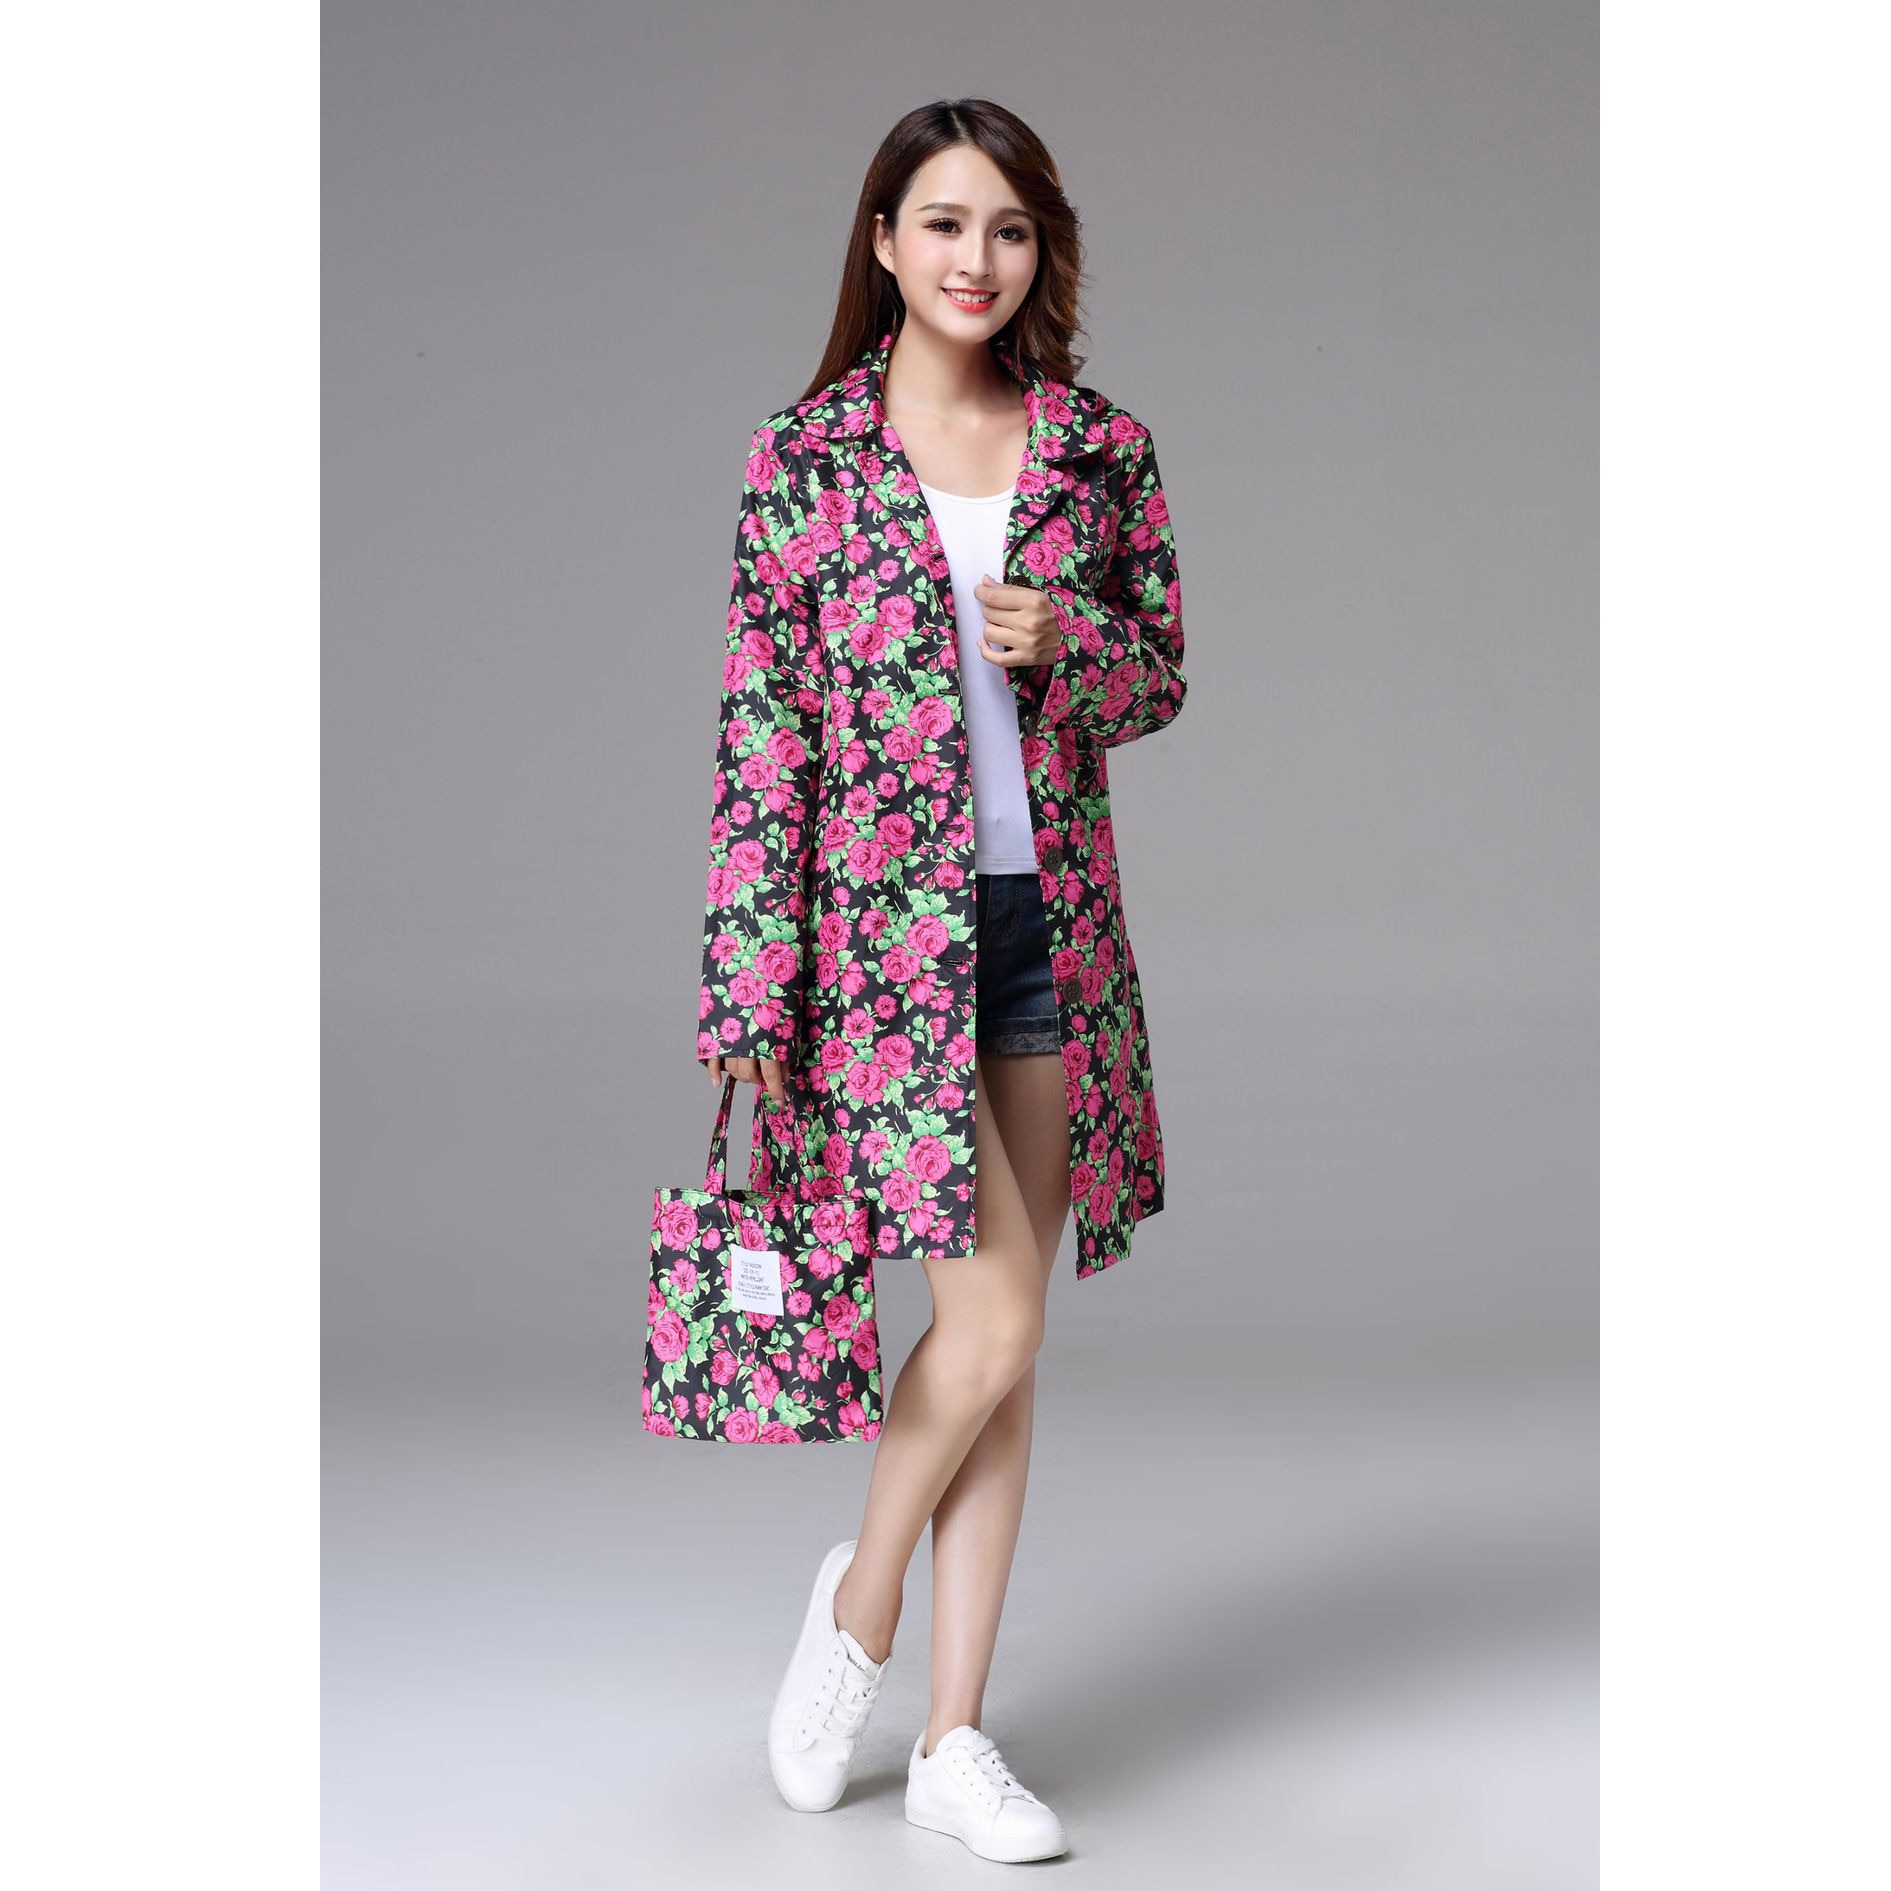 Red Rain Jacket impermeable  Women Raincoat Hiking   Fashion Rain Coat 190T Nylon Fabric  Rain Jacket Girls